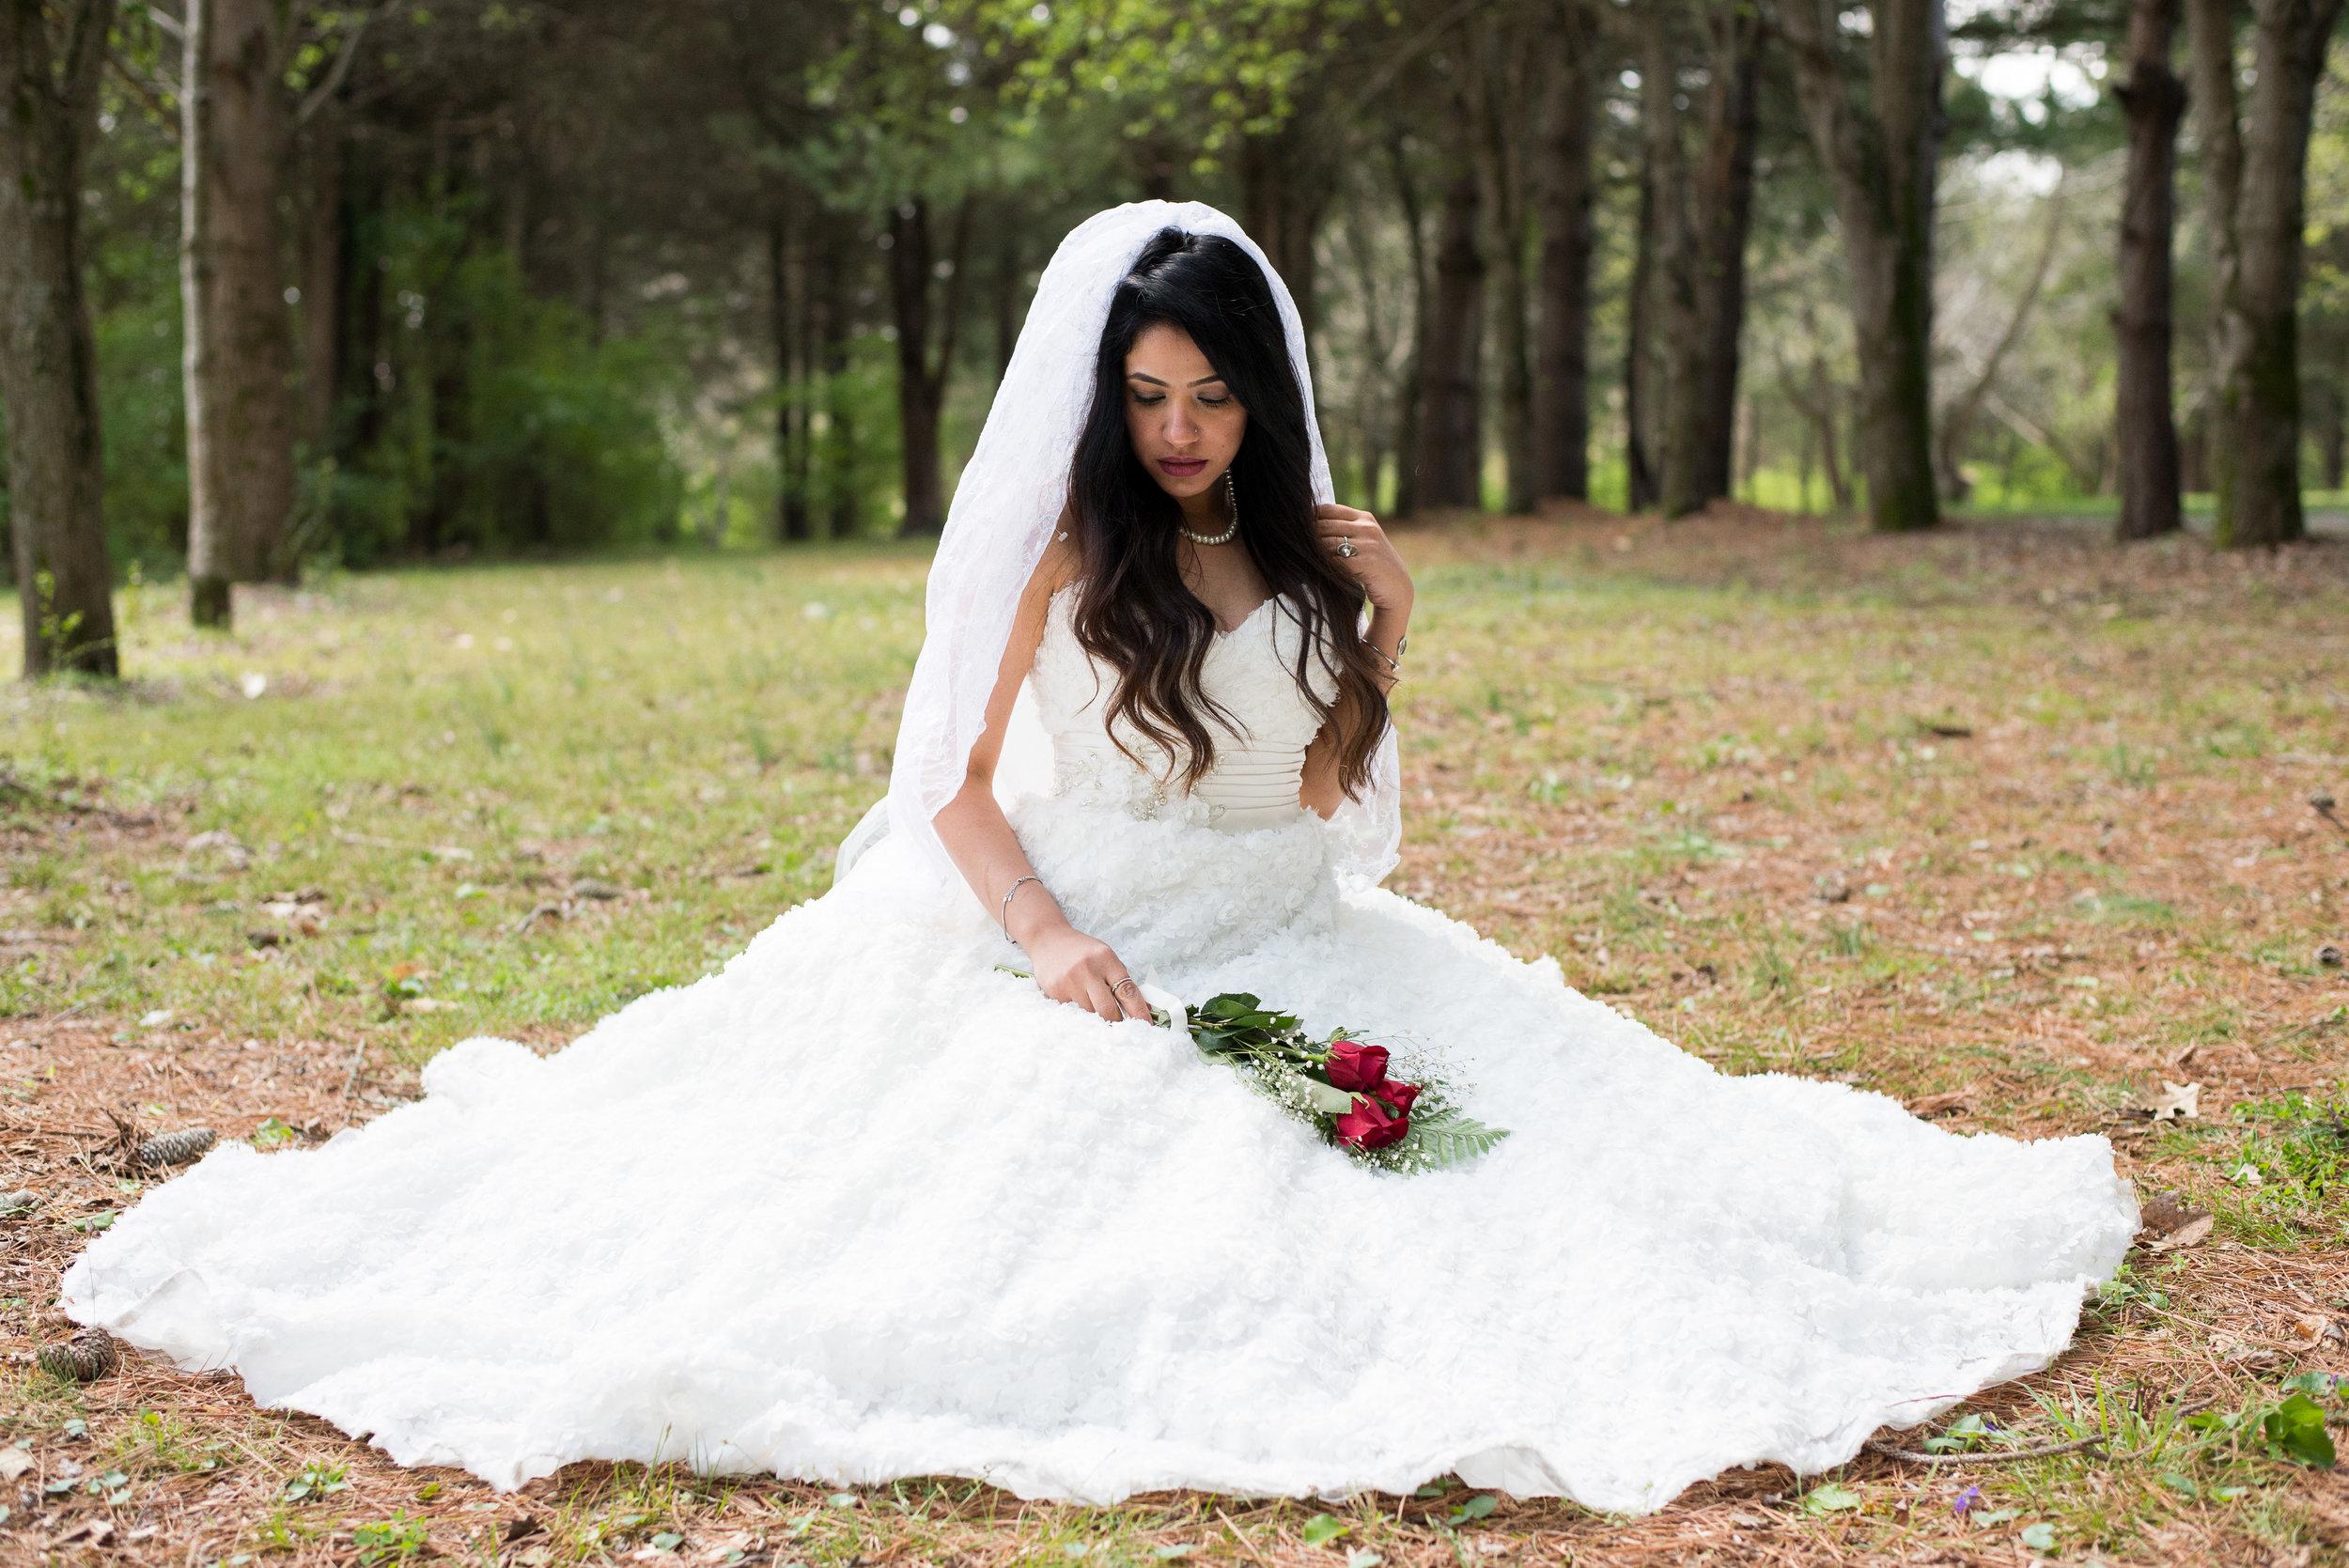 Destination Wedding Photographer, Destination Weddings, Travel Wedding Photographer, Wedding Photographer, Vanessa Jordan Photography